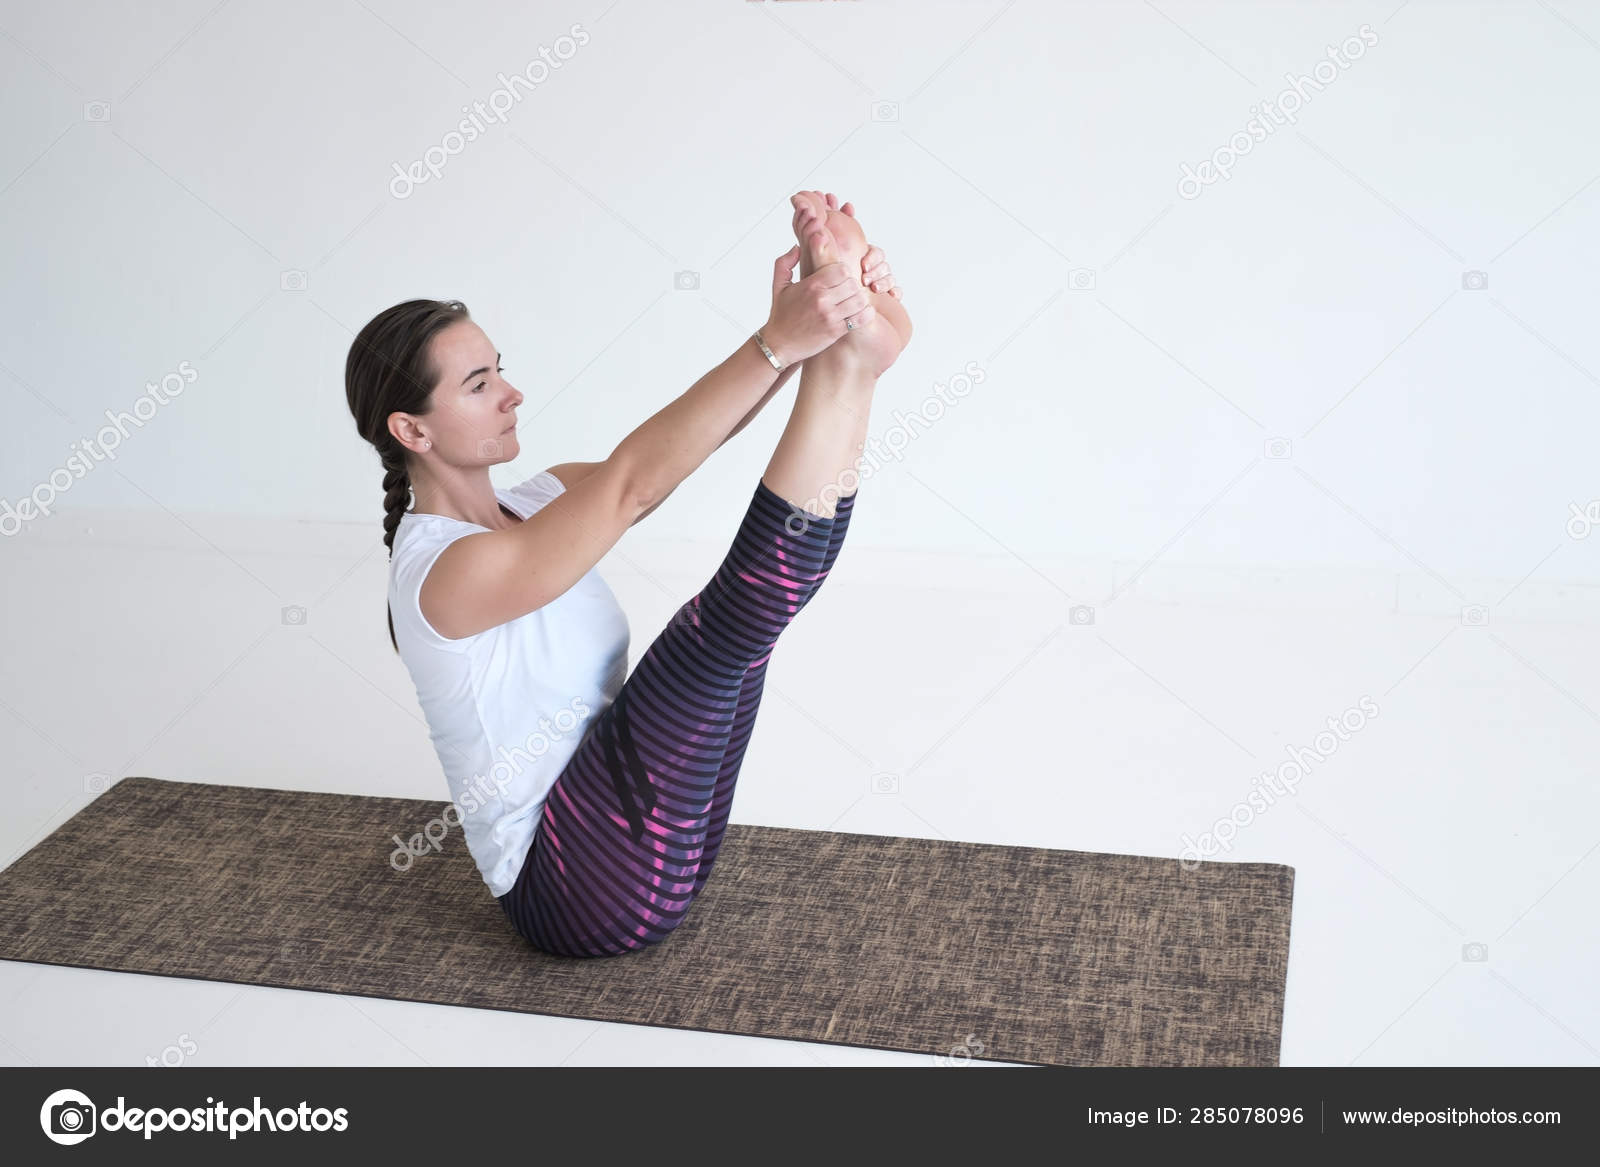 Sporty Woman Doing Yoga Exercises Sitting In Paripurna Navasana Full Boat Pose Stock Photo C Koldunov 285078096